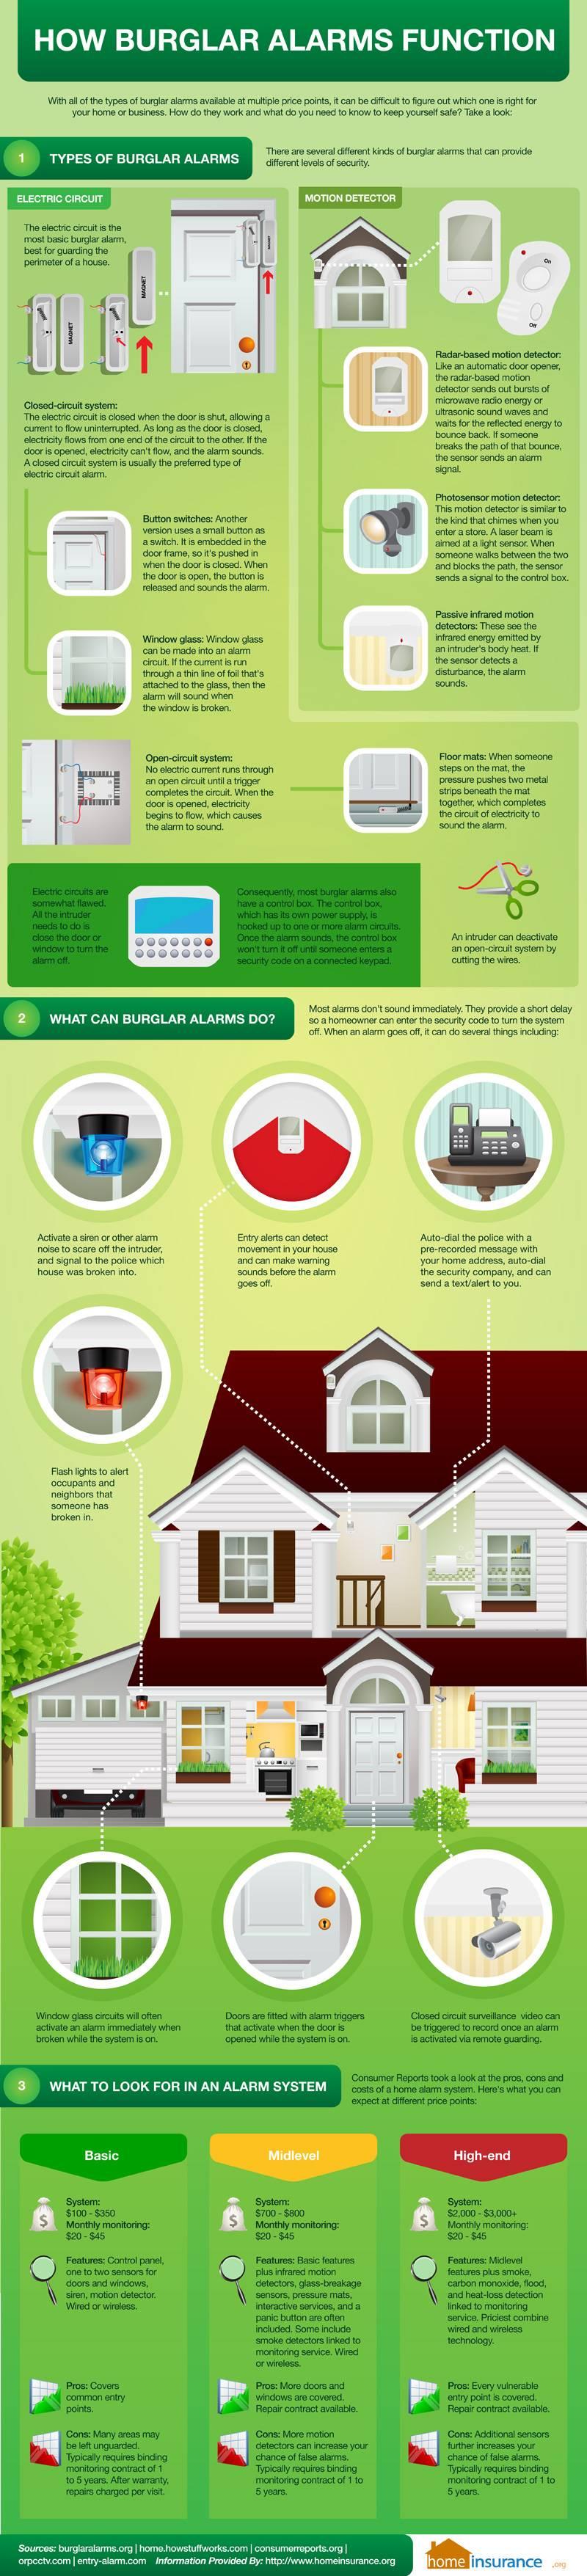 How Burglar Alarms Function